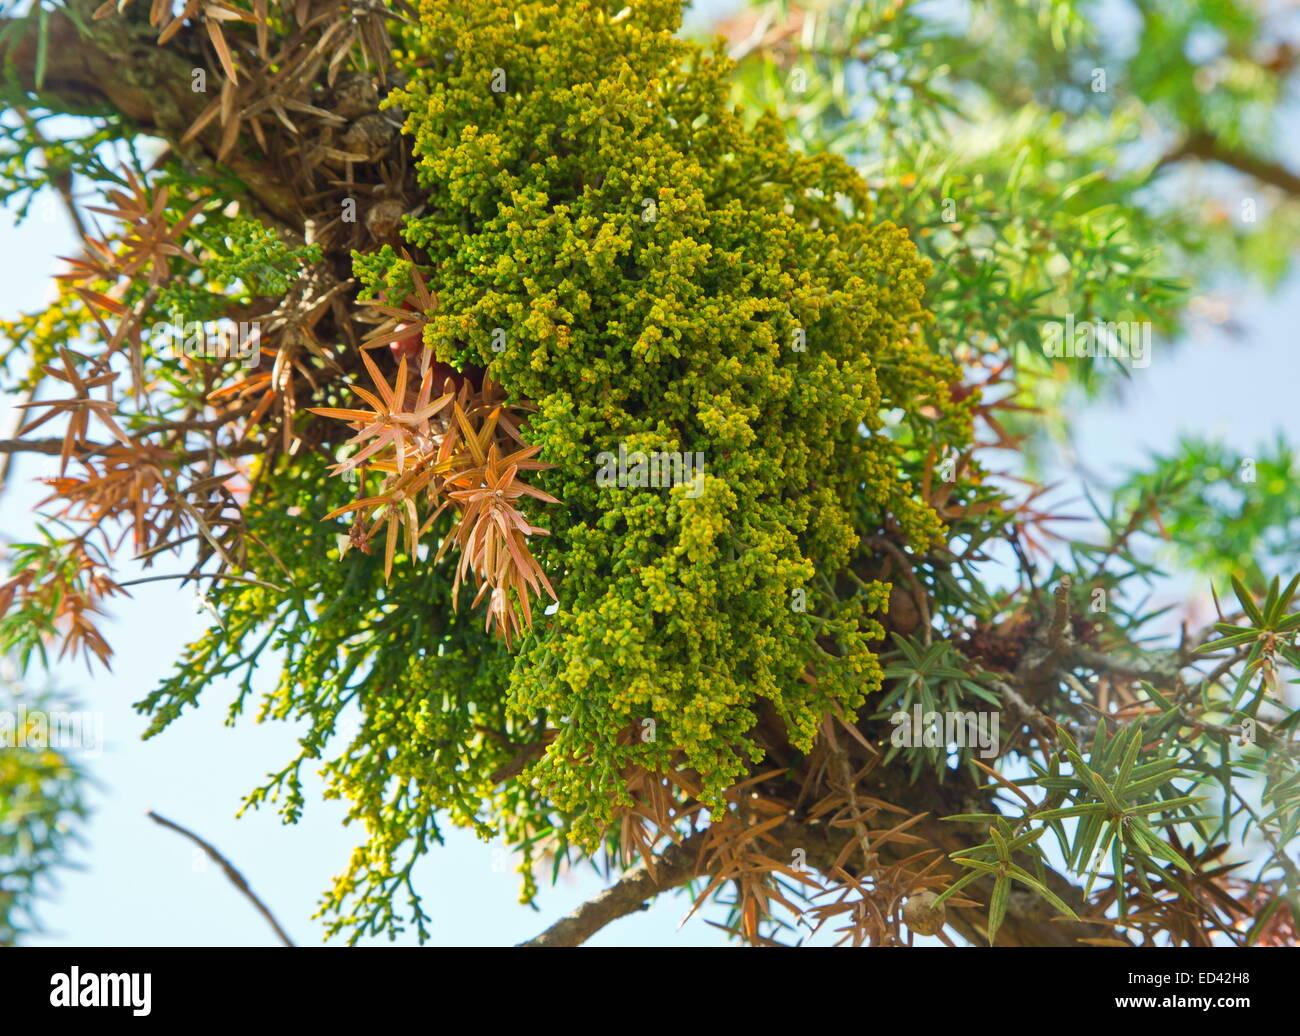 Juniper Dwarf Mistletoe,  Arceuthobium oxycedri, - a semi-parasite on Juniper. Turkey - Stock Image